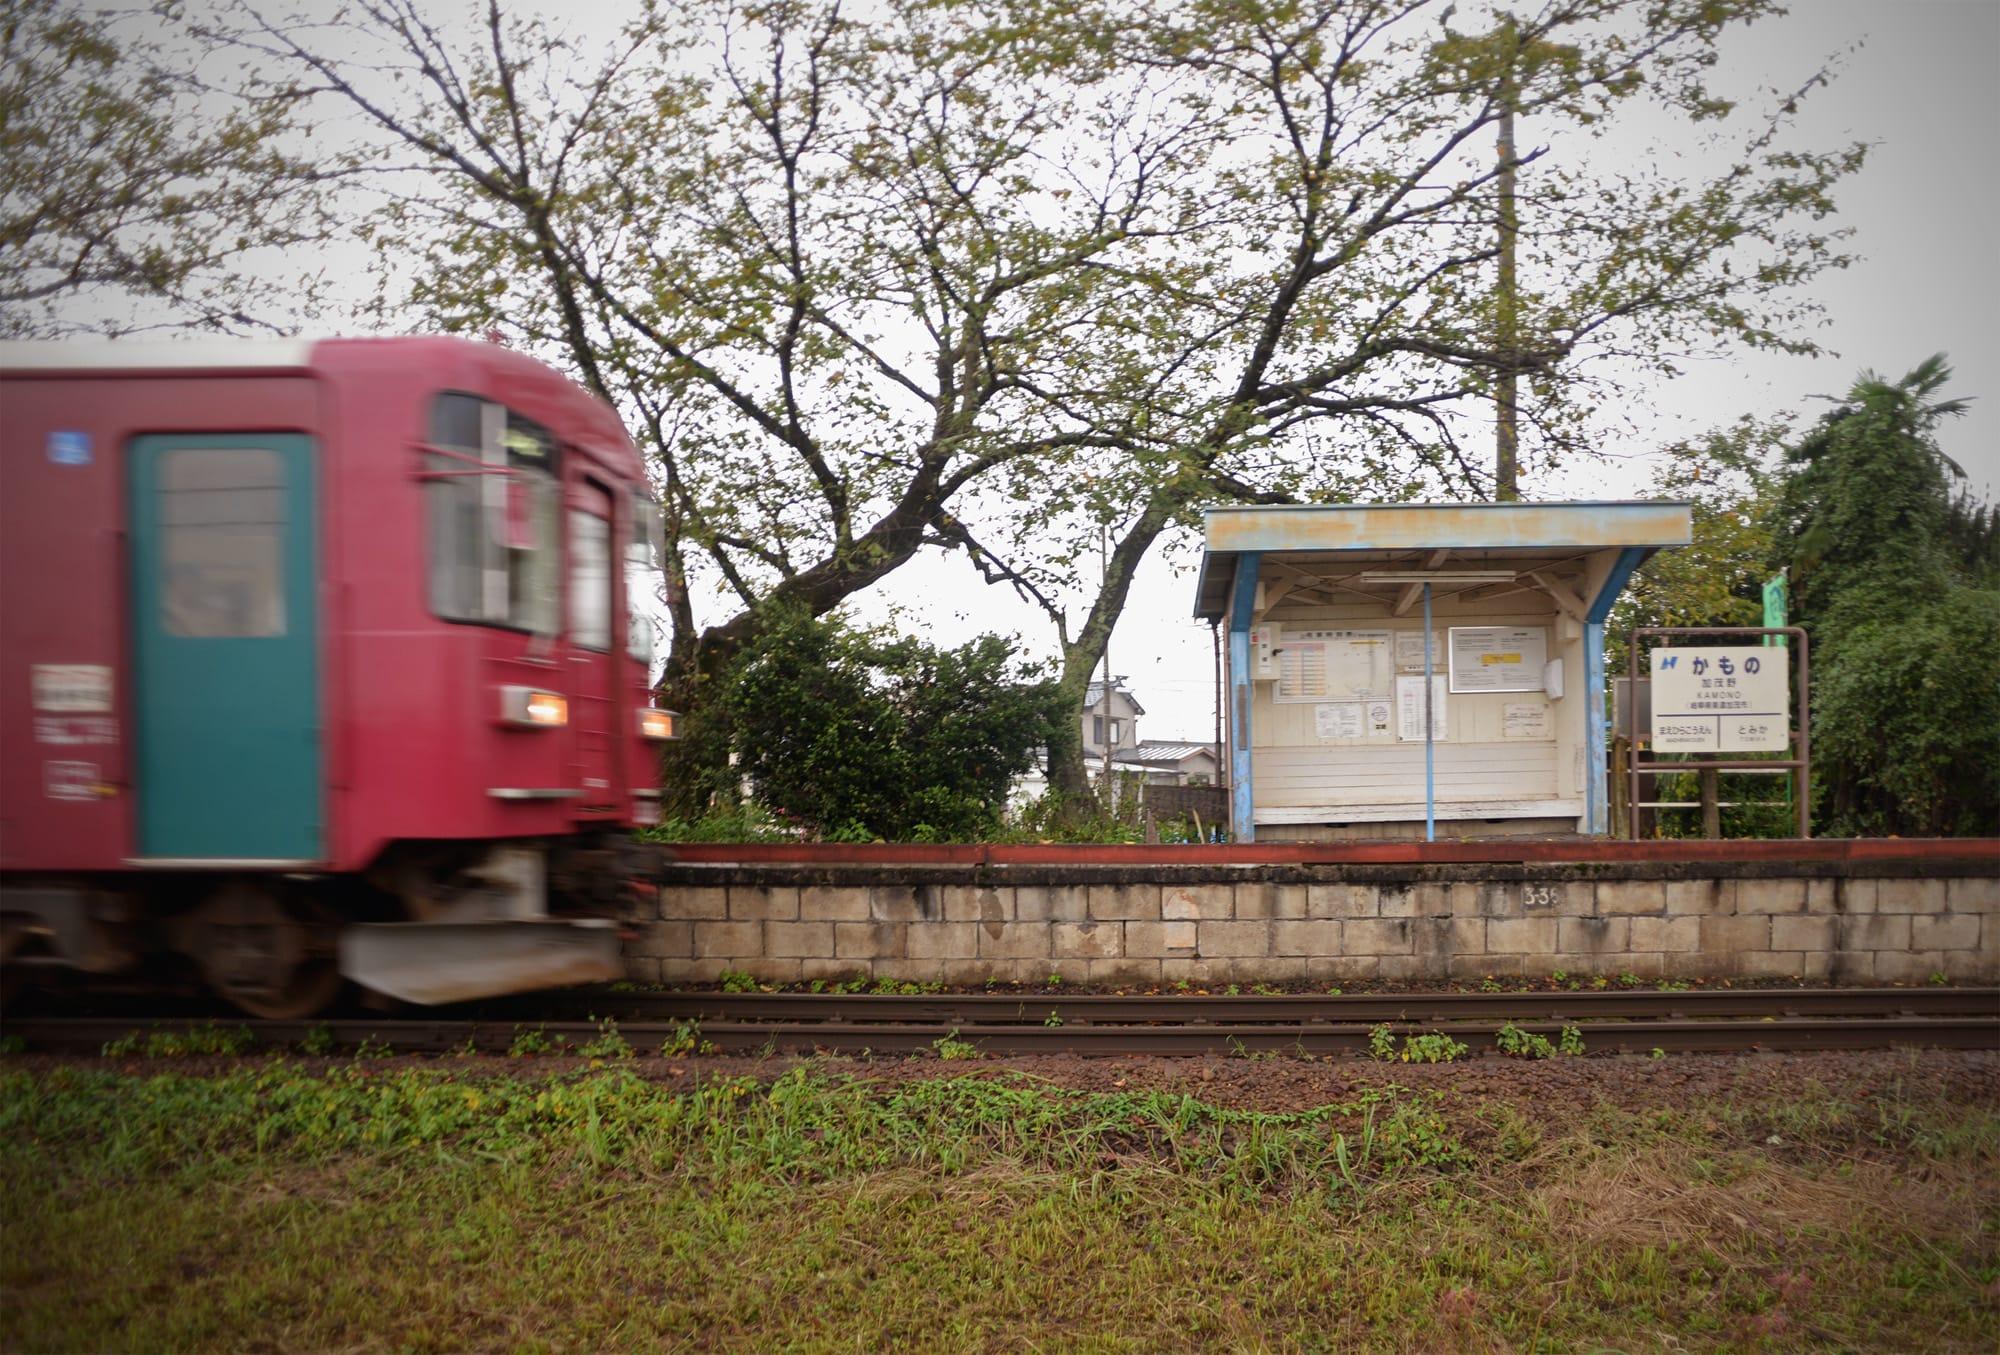 美濃加茂市:雨の加茂野駅